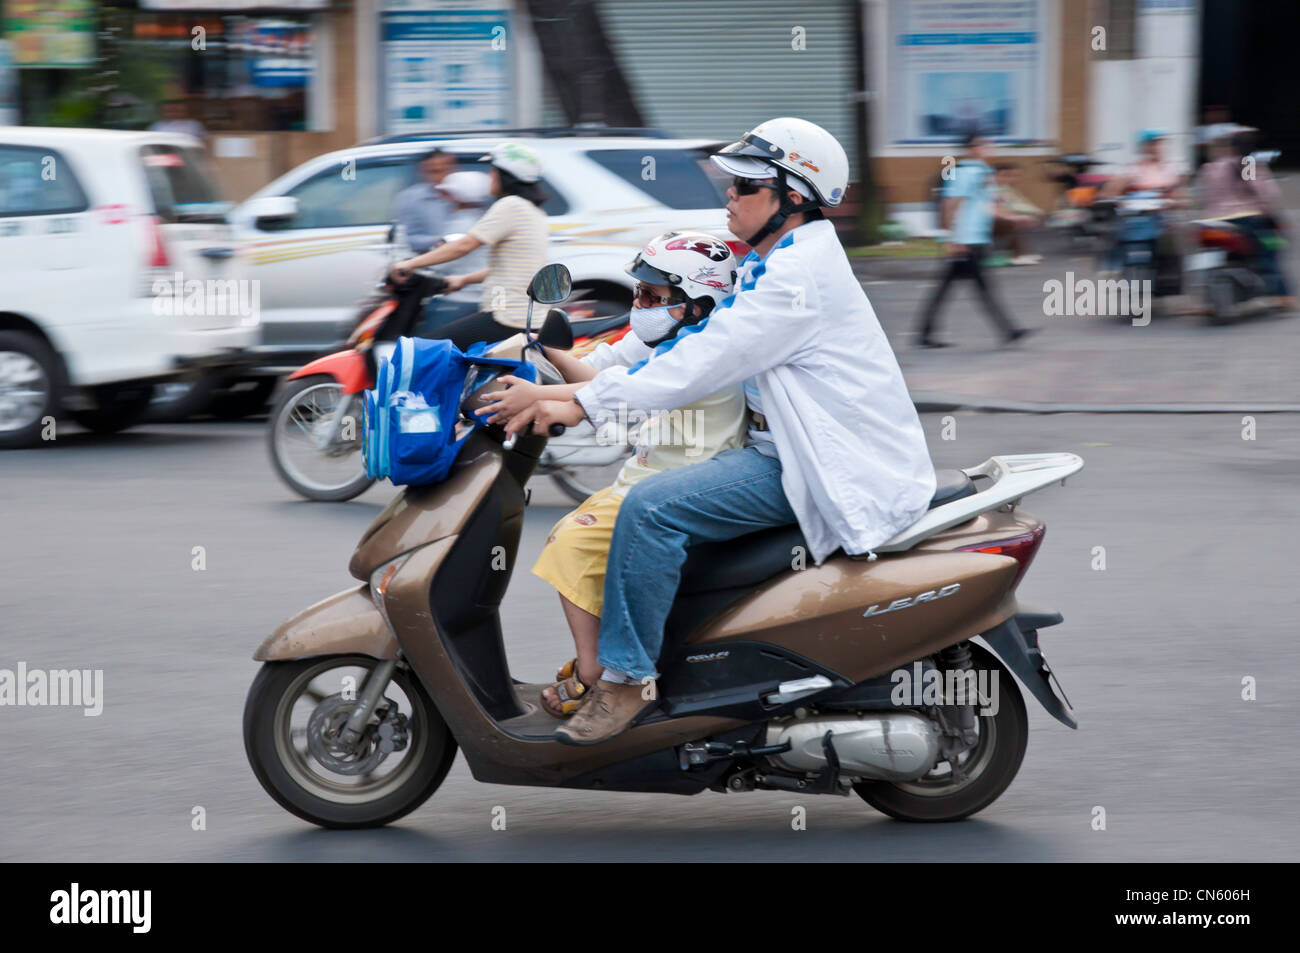 Schoolboy travelling home by motorbike, Saigon, Vietnam - Stock Image